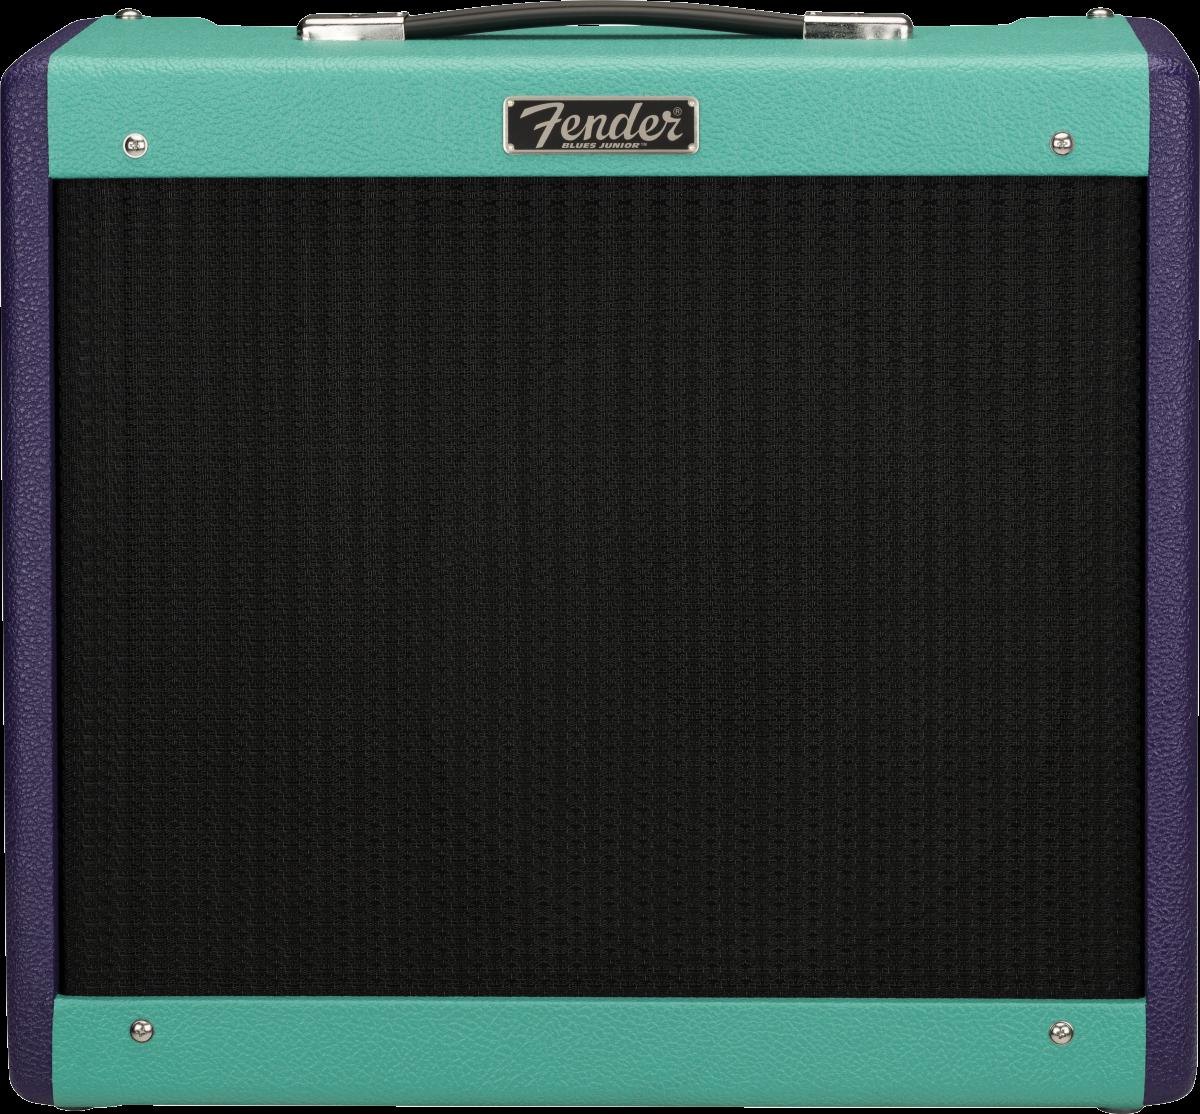 Fender LIMITED EDITION BLUES JUNIOR™ IV, EMINENCE® CANNABIS REX™, TWO-TONE PURPLE/SEAFOAM